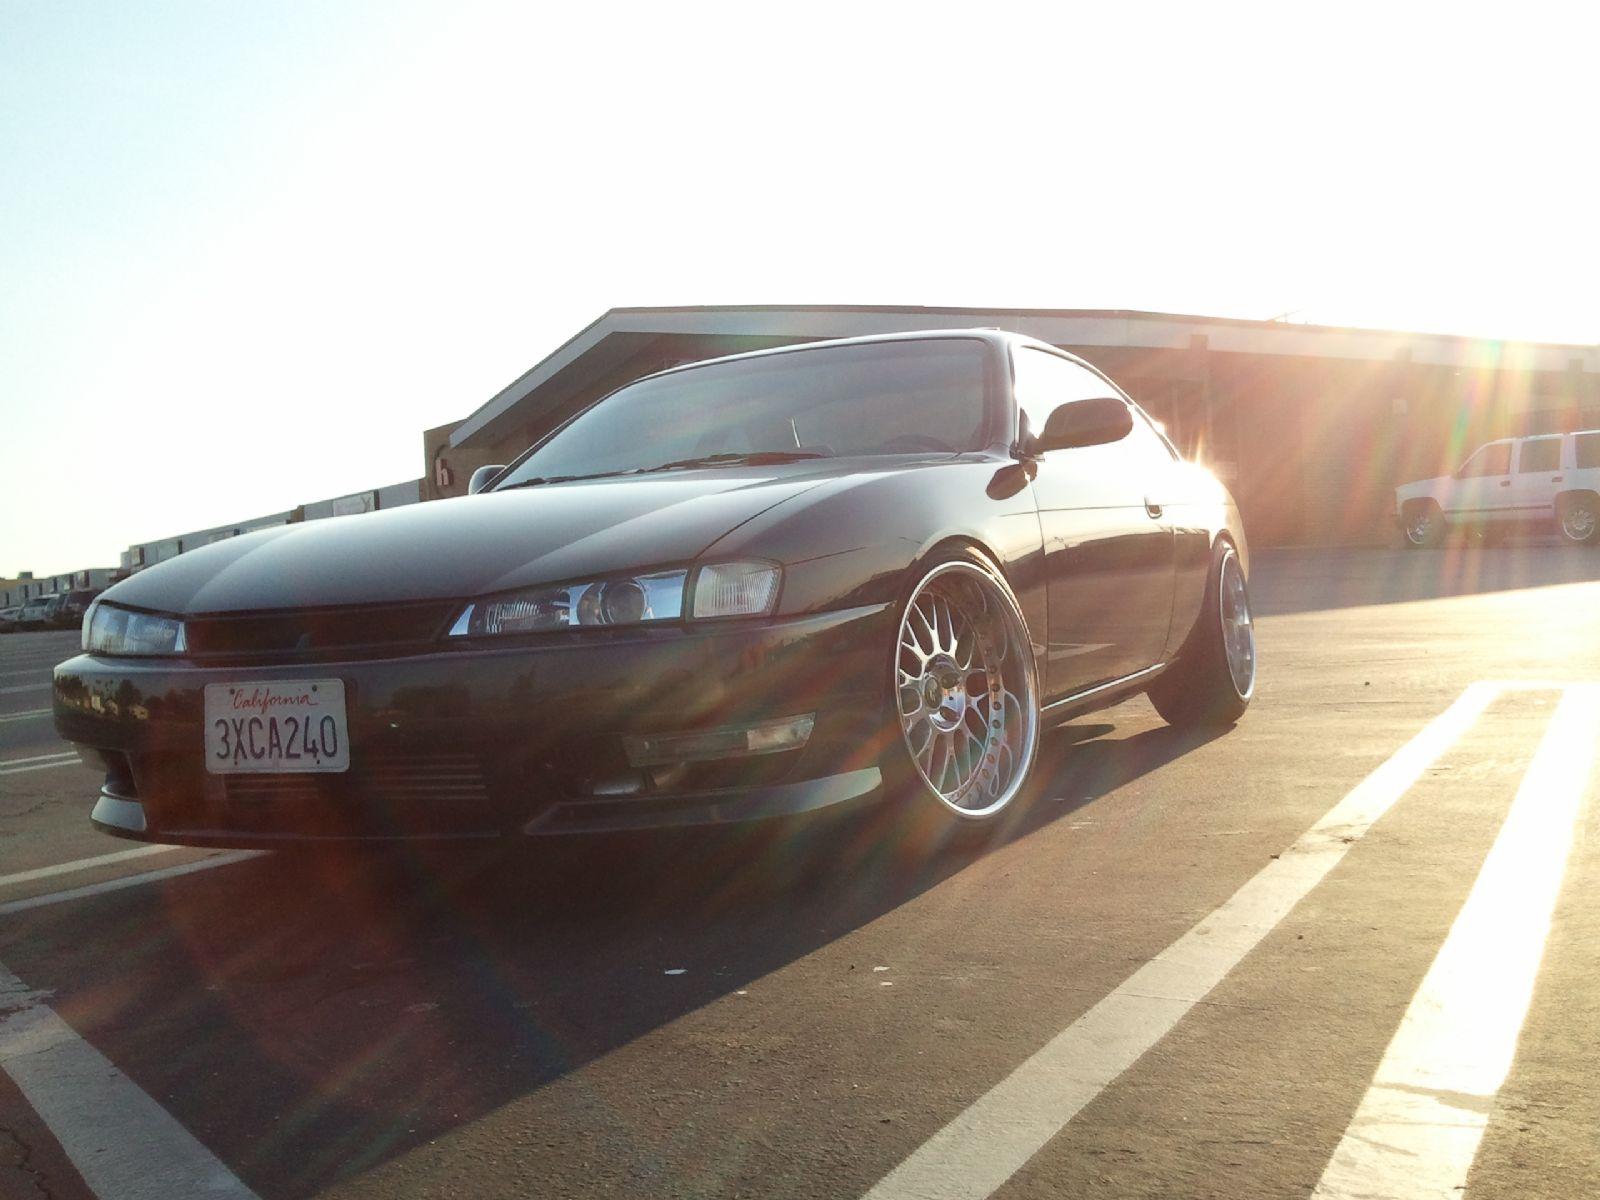 1997 Nissan S14 Kouki Silvia 240sx Se For Sale Los Angeles